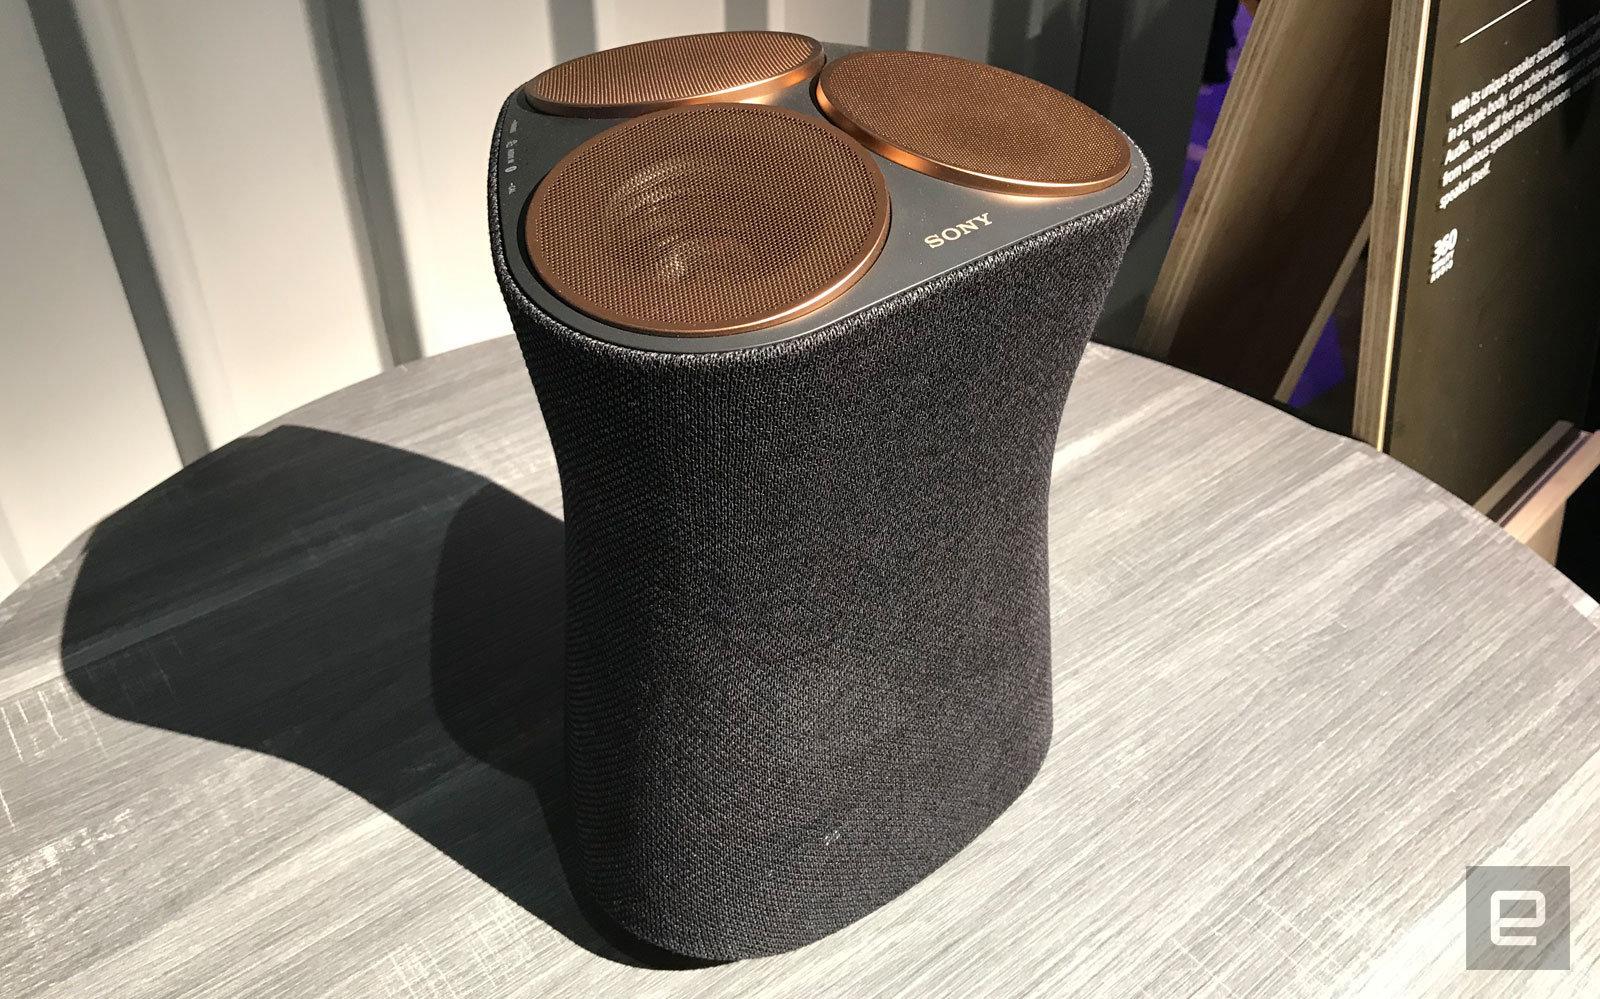 Sony 360 Reality Audio speaker